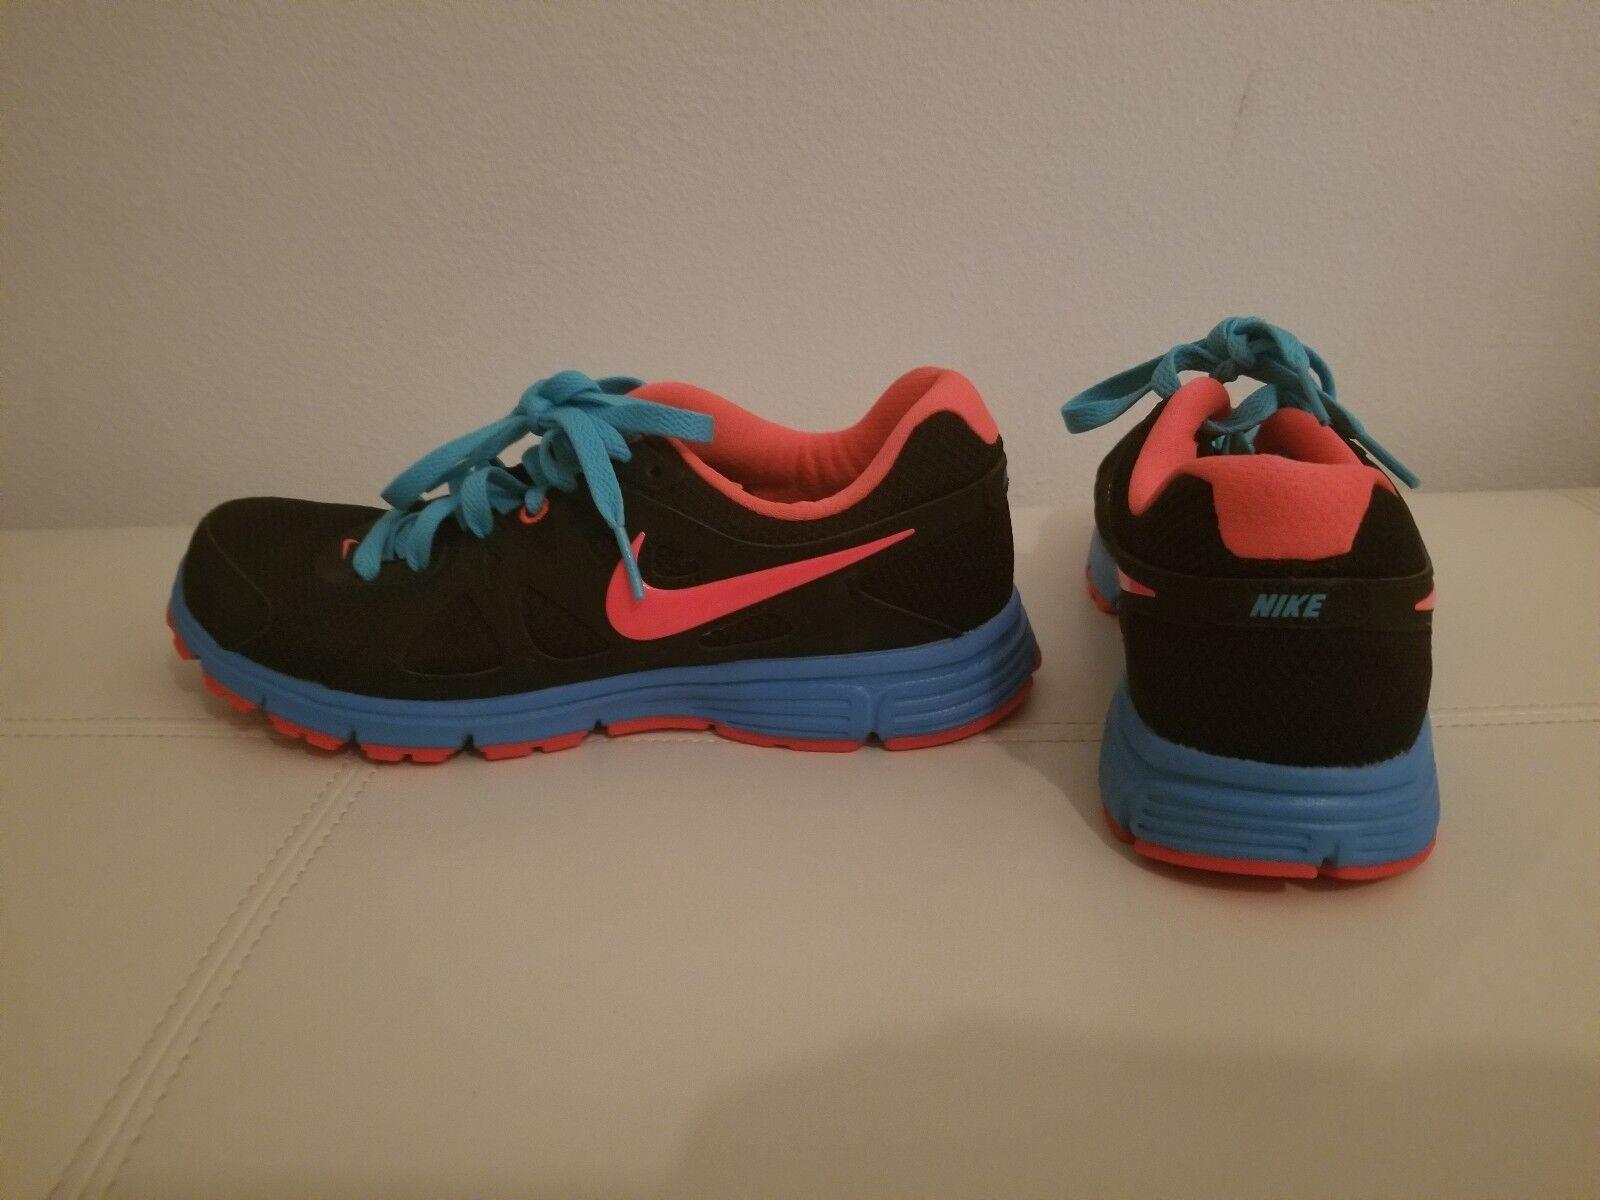 NEW femmes rose Nike Noir Bleu Hot rose femmes Electric Mesh Running Training Chaussures 7.5 61e31e